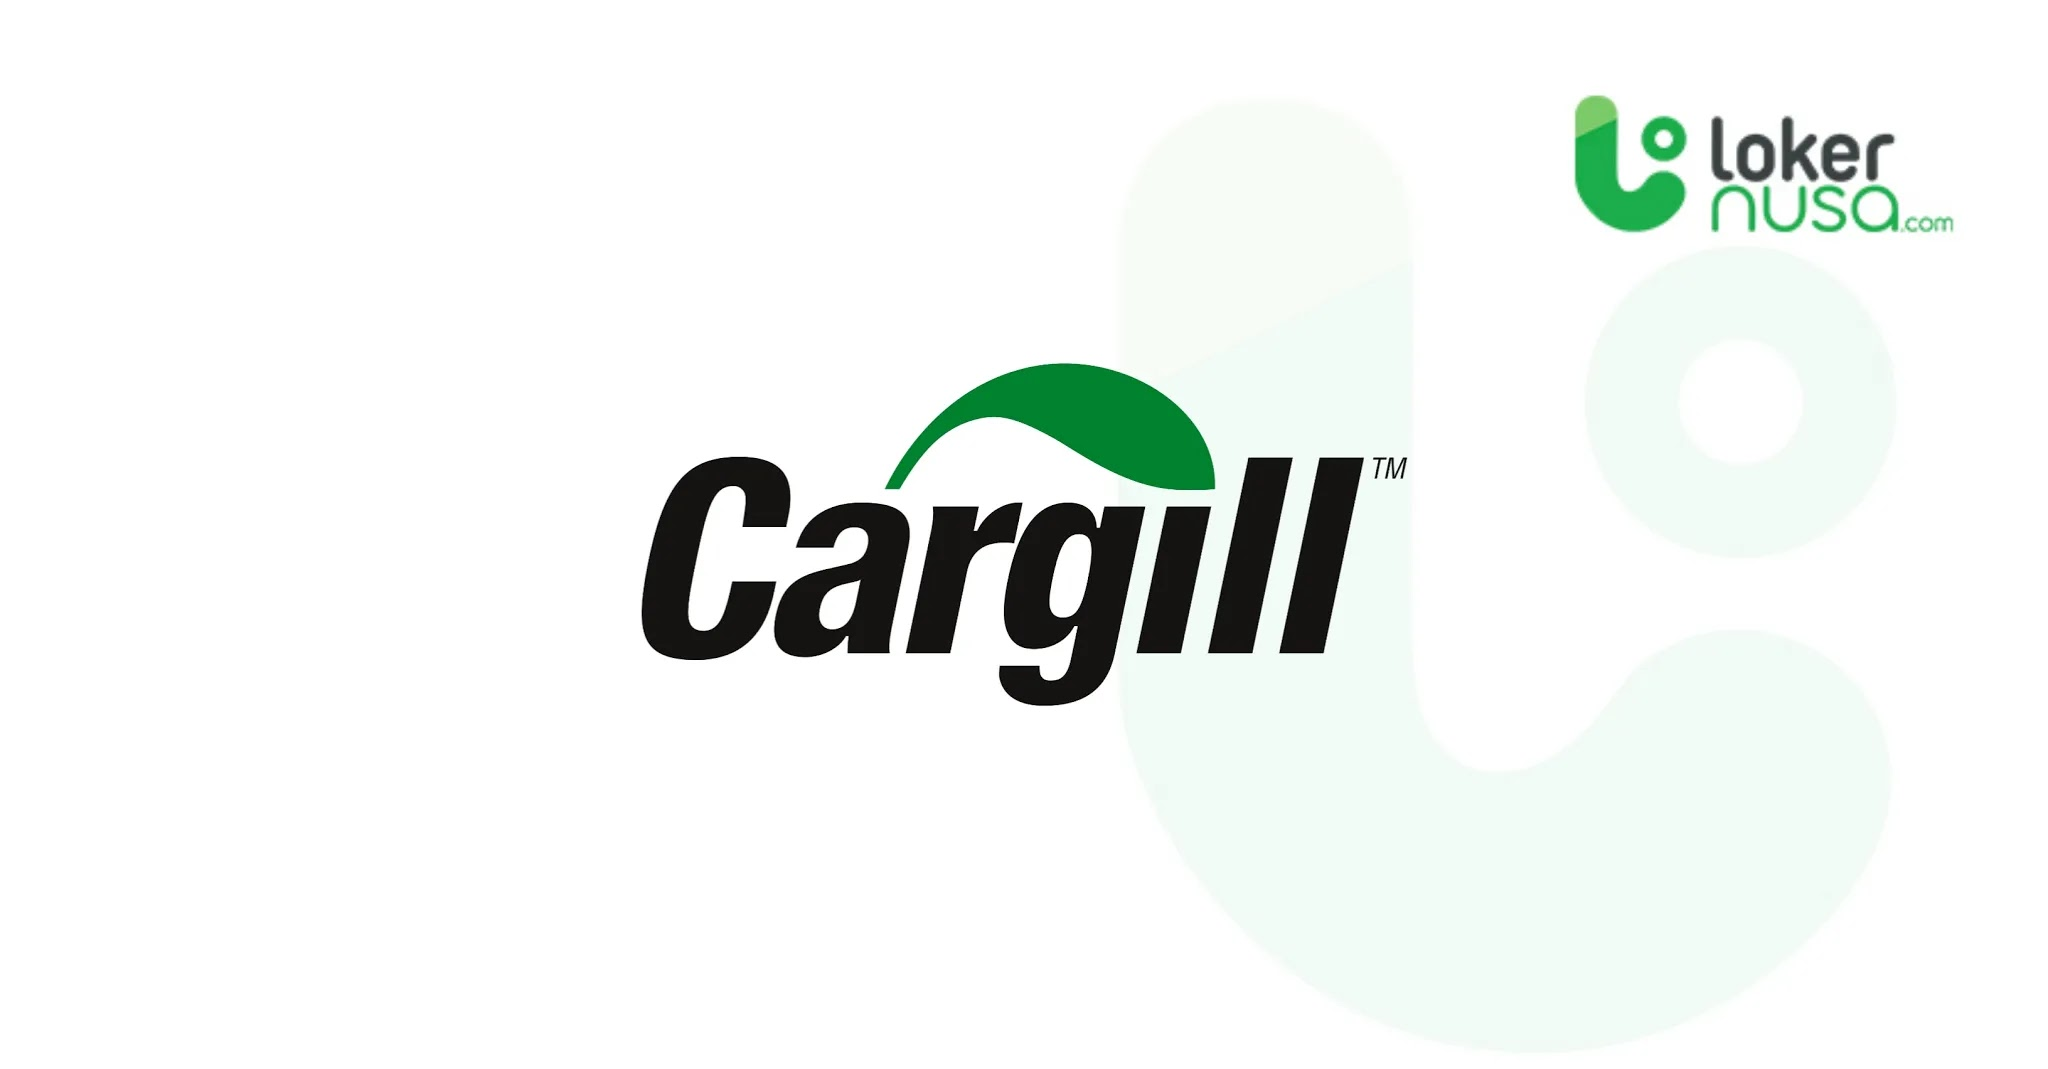 Lowongan Kerja Juli 2021 Cargill